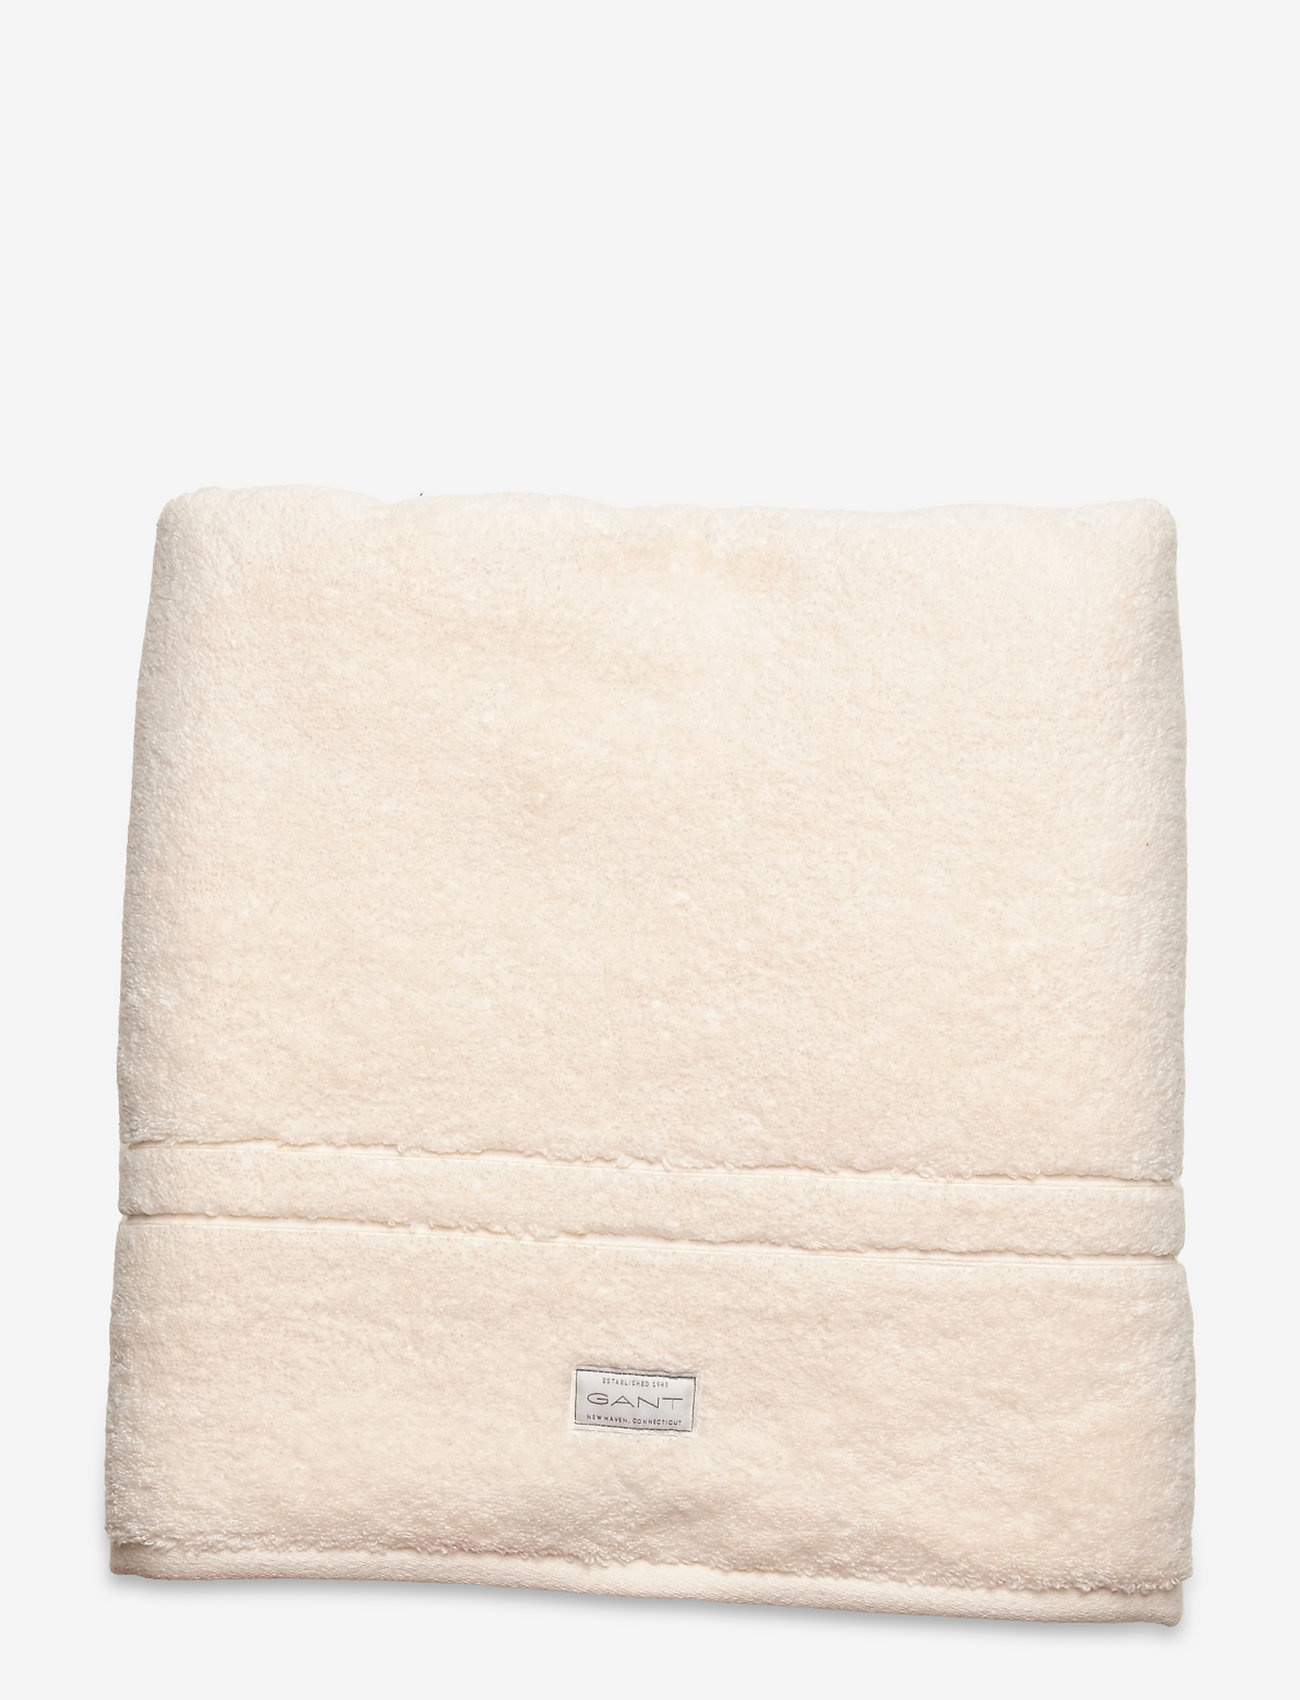 GANT - PREMIUM TOWEL 50X70 - pyyhkeet & kylpypyyhkeet - white - 0